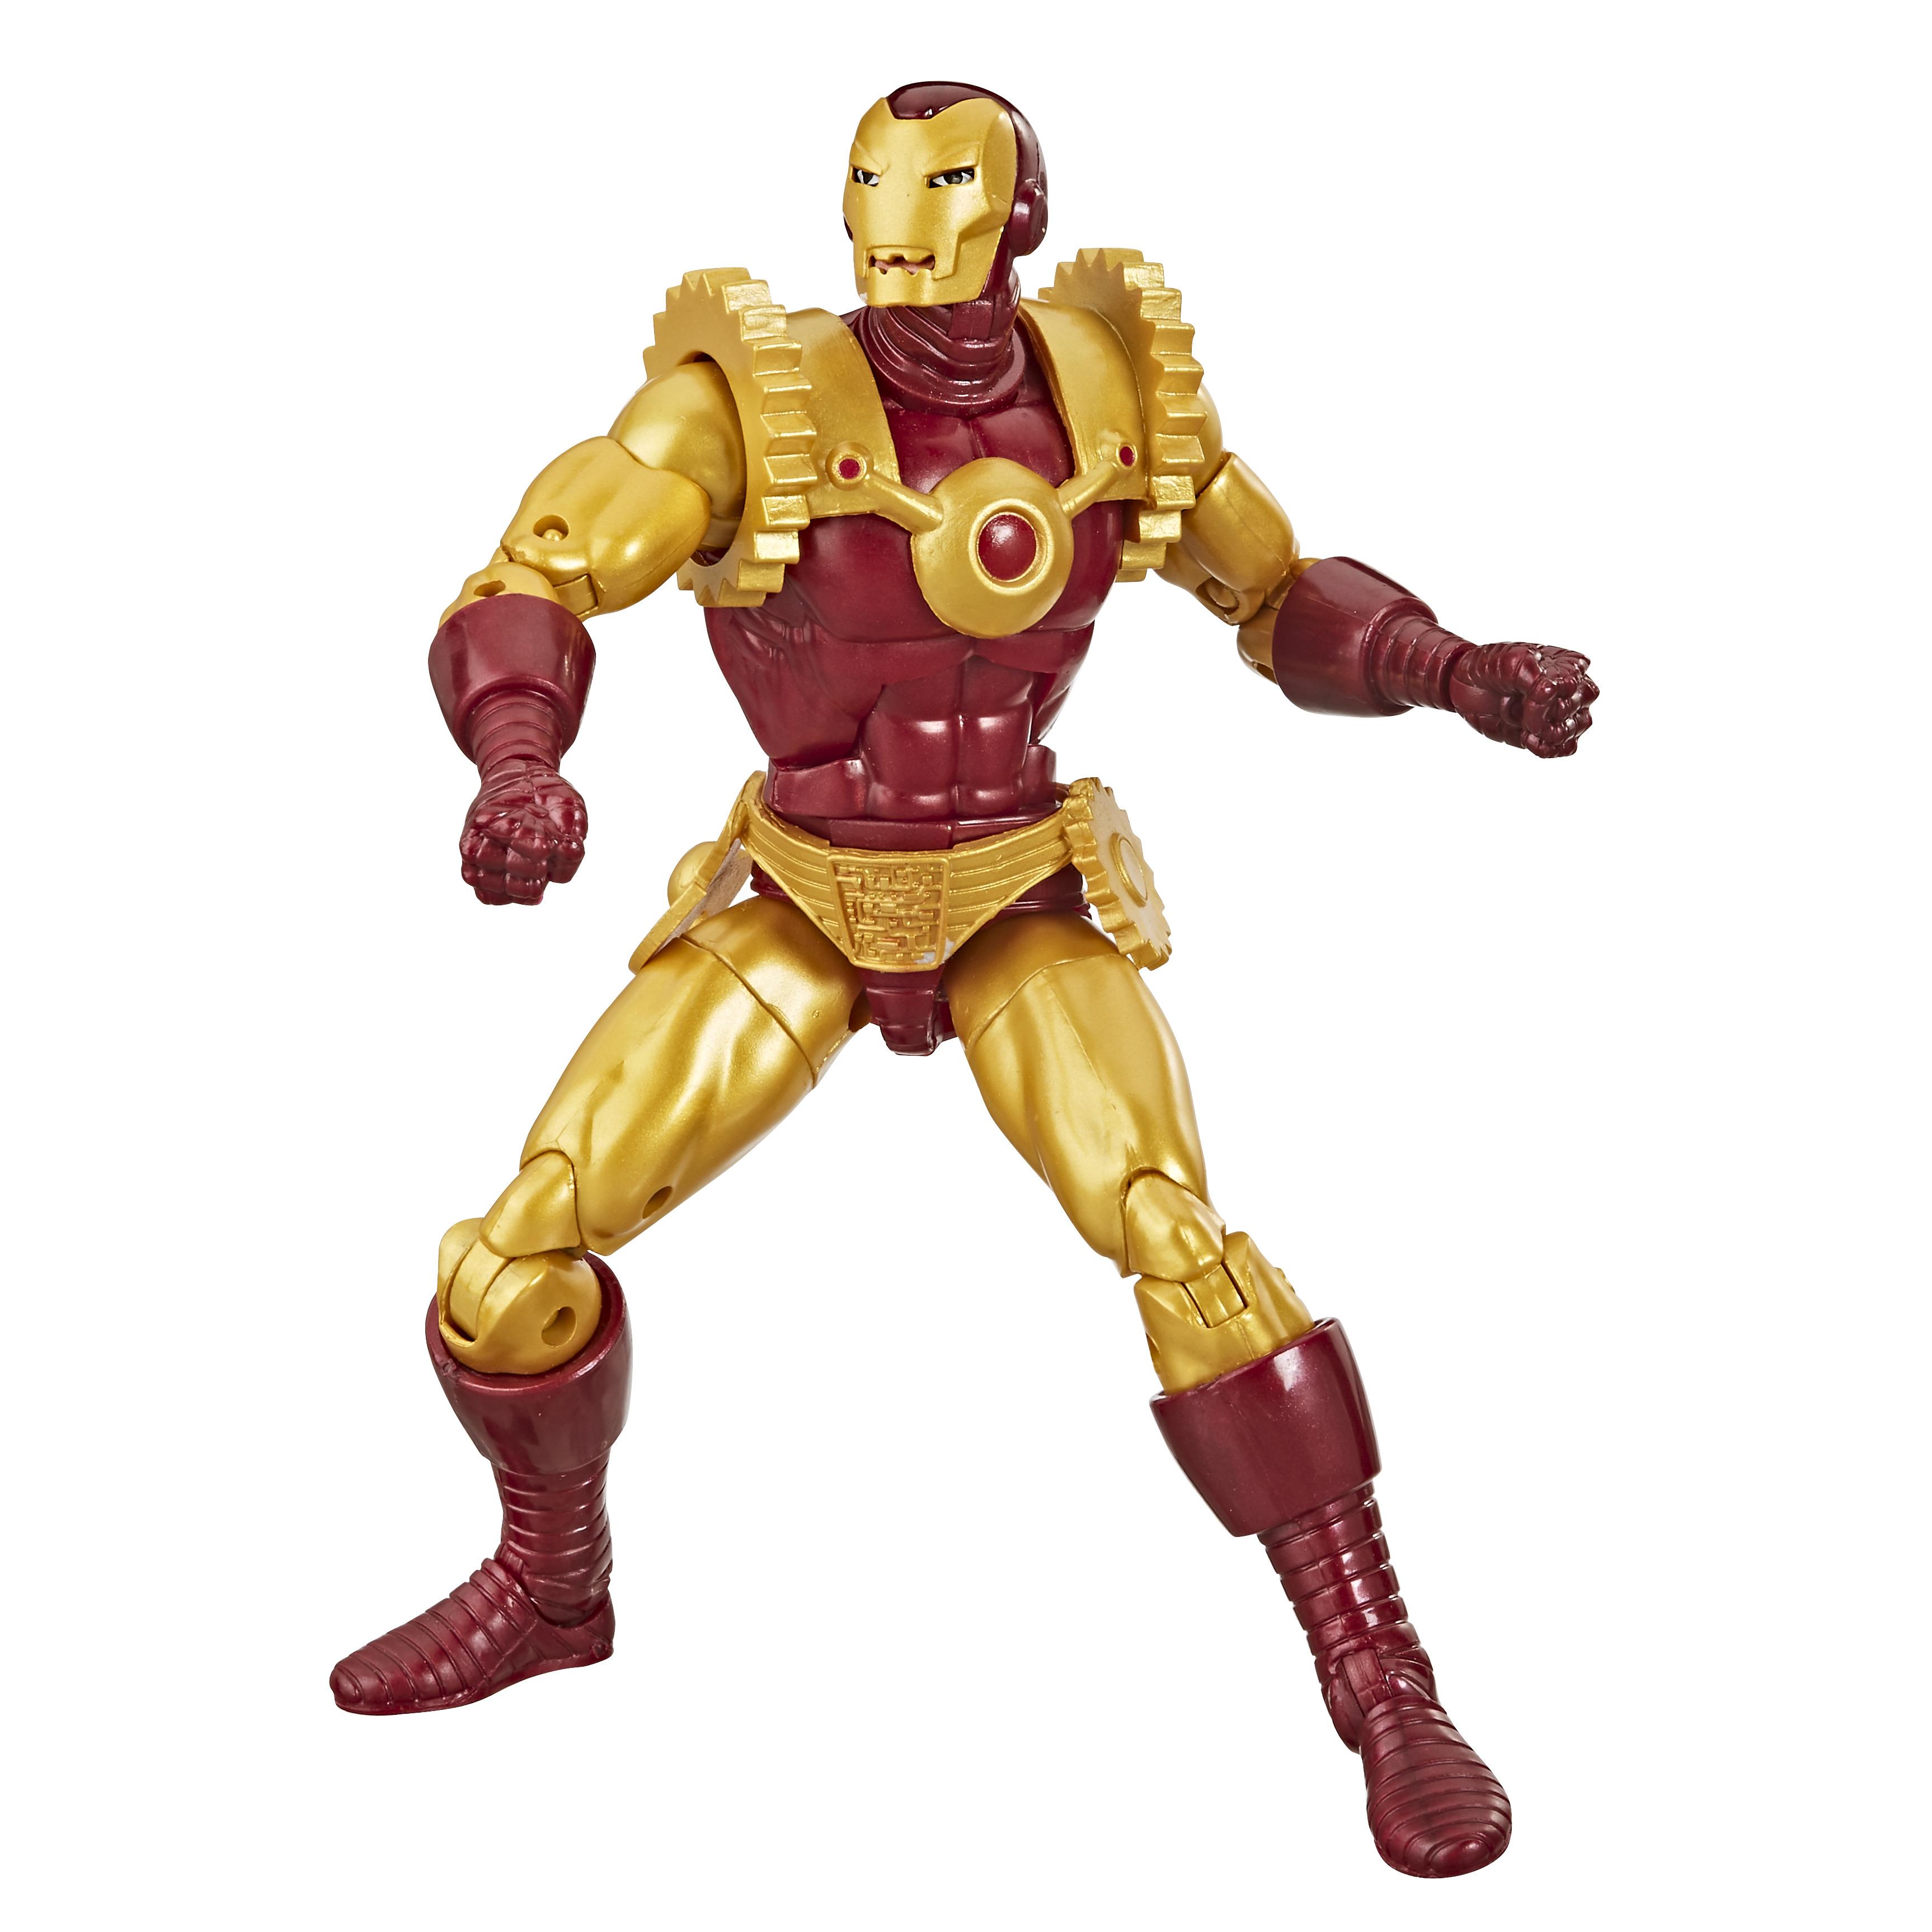 E87085L00 Marvel Legends Iron Man 2020 main 2